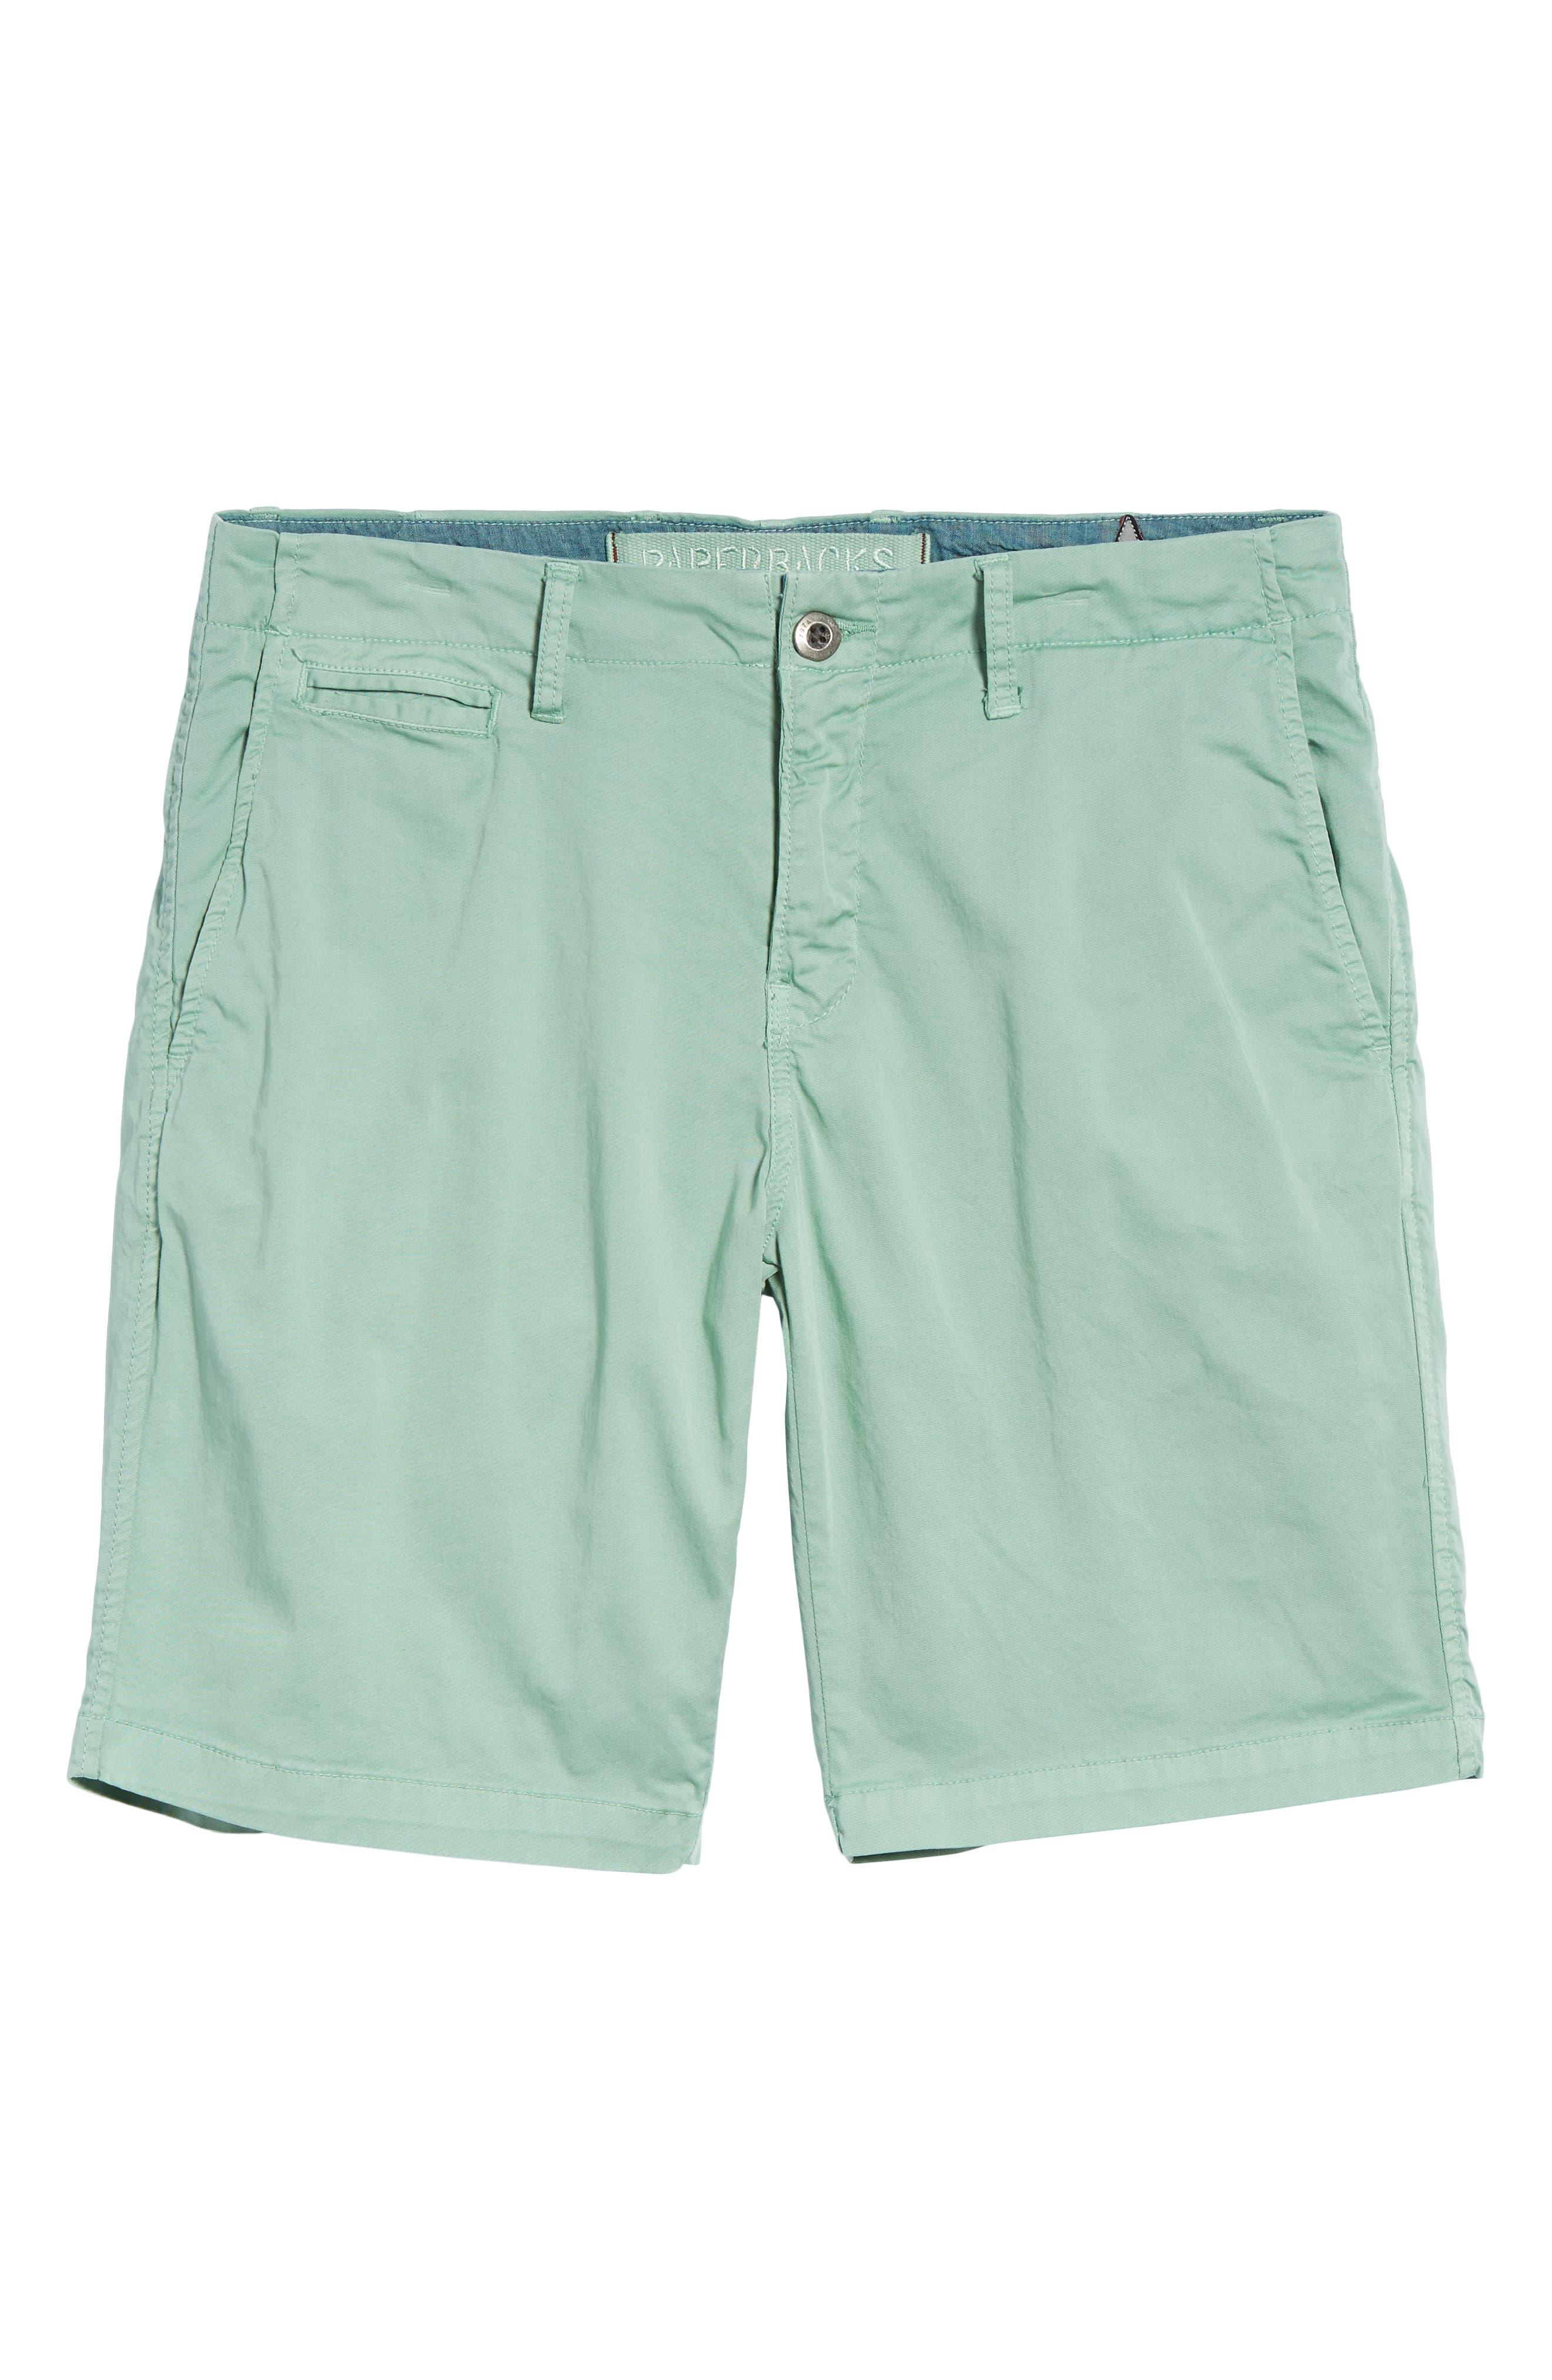 St. Barts Twill Shorts,                             Alternate thumbnail 67, color,